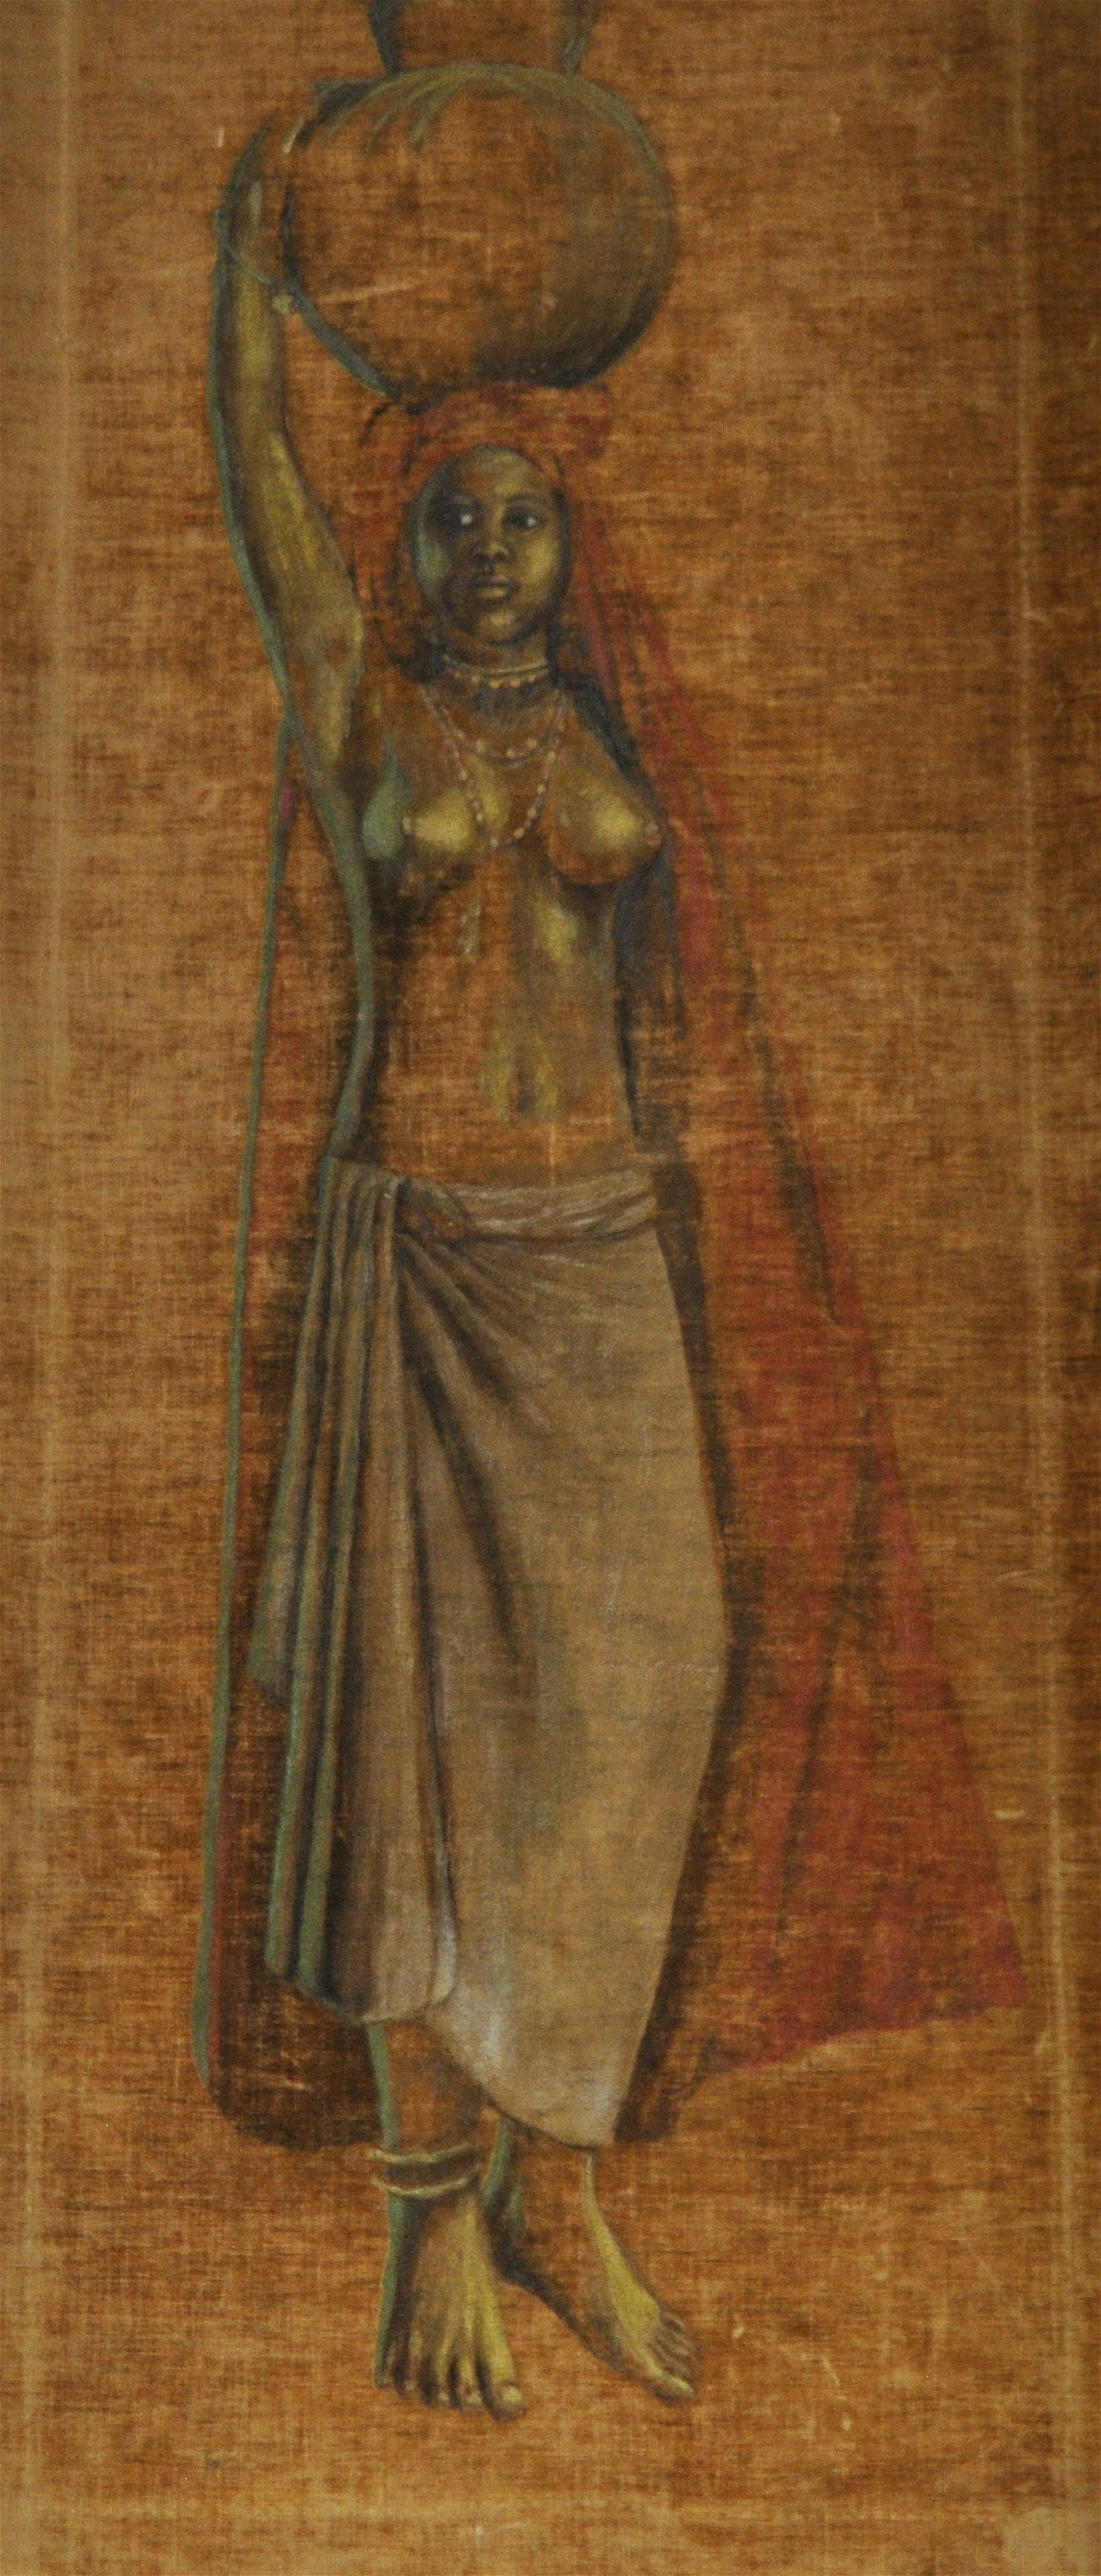 Vintage African Water bearer Painting On Velvet